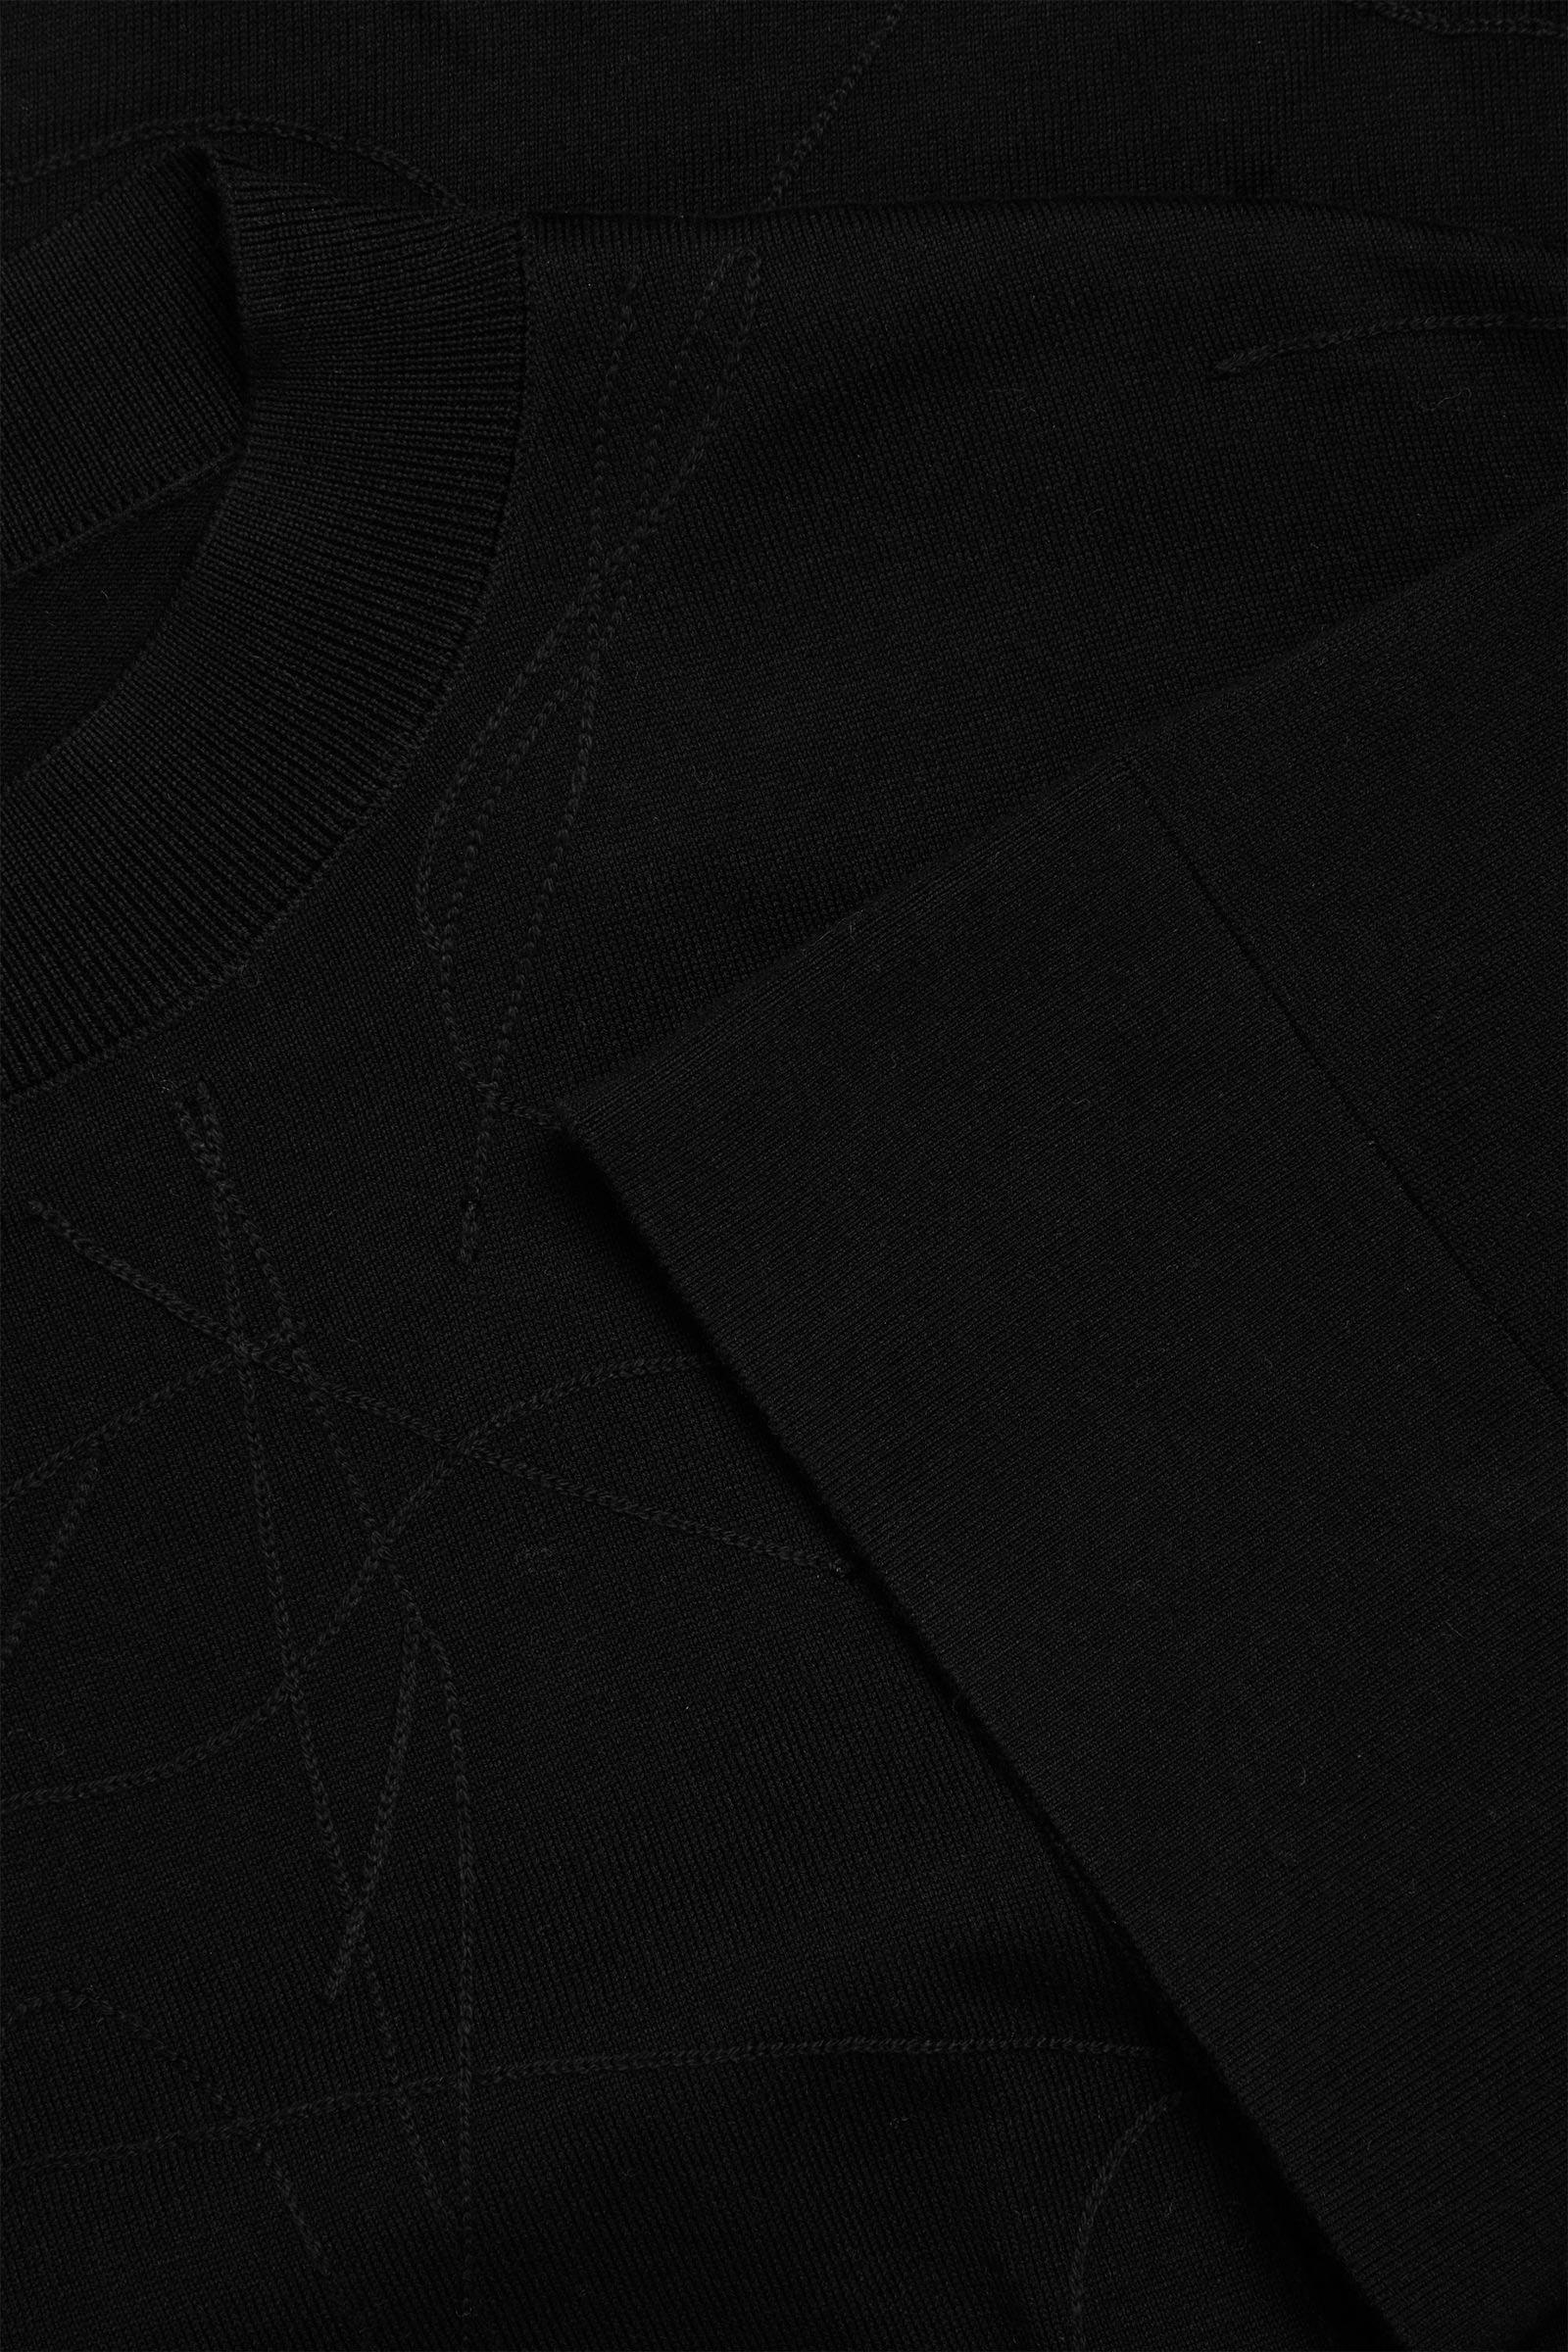 COS 오가닉 코튼 앱스트랙트 스티치 디테일 드레스의 블랙컬러 Detail입니다.